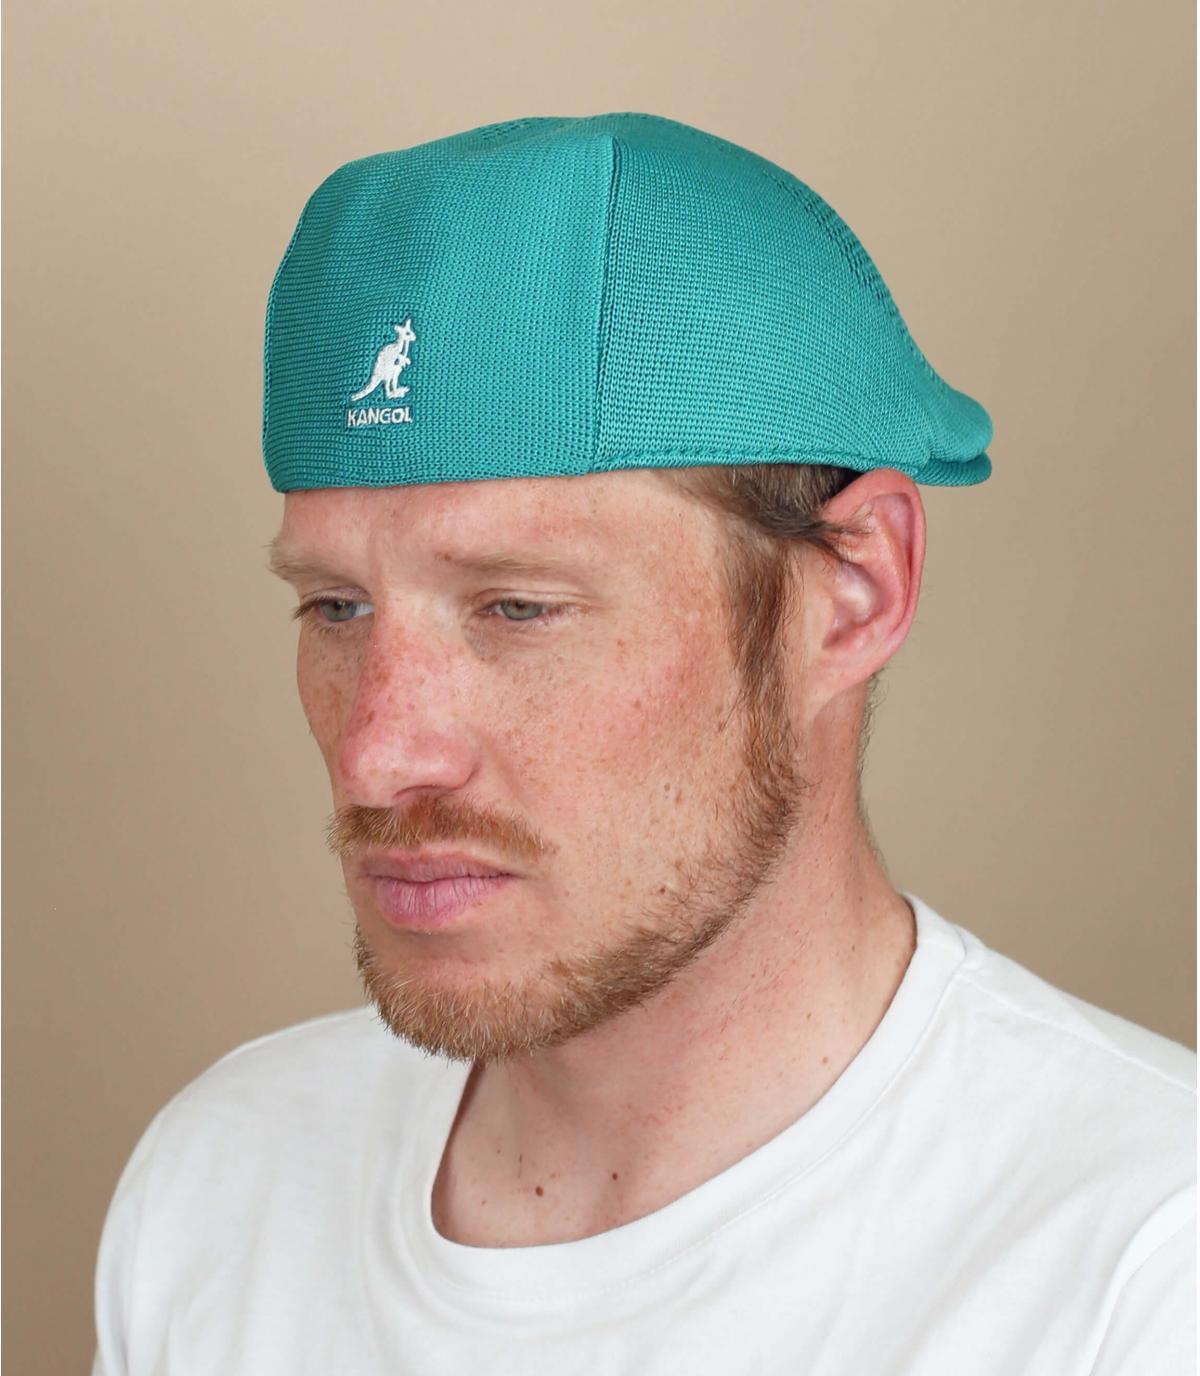 Gorra azul calada Kangol